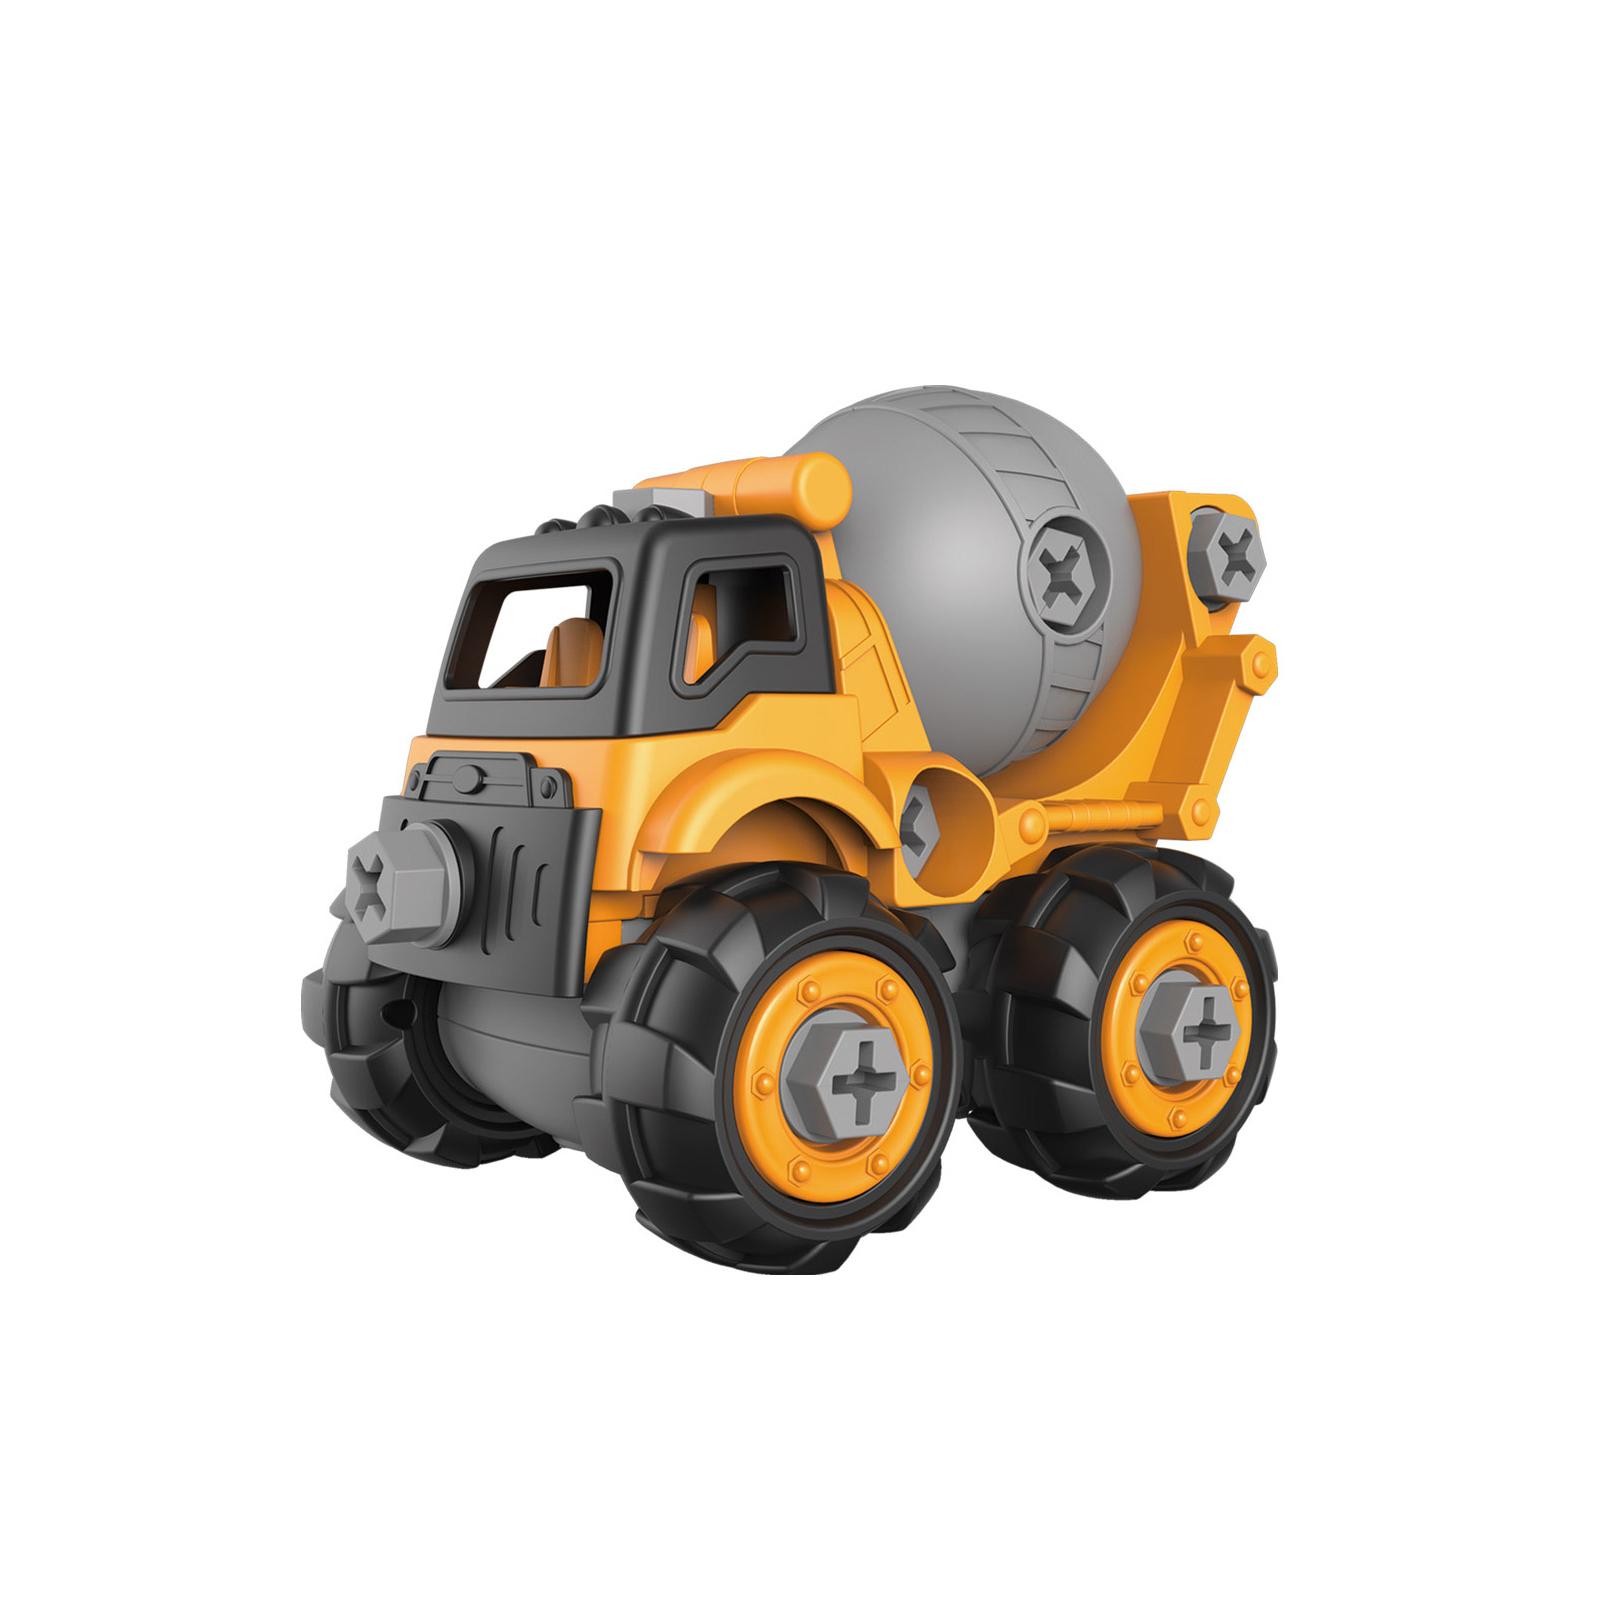 Конструктор Microlab Toys Строительная техника - бетономешалка (MT8908)